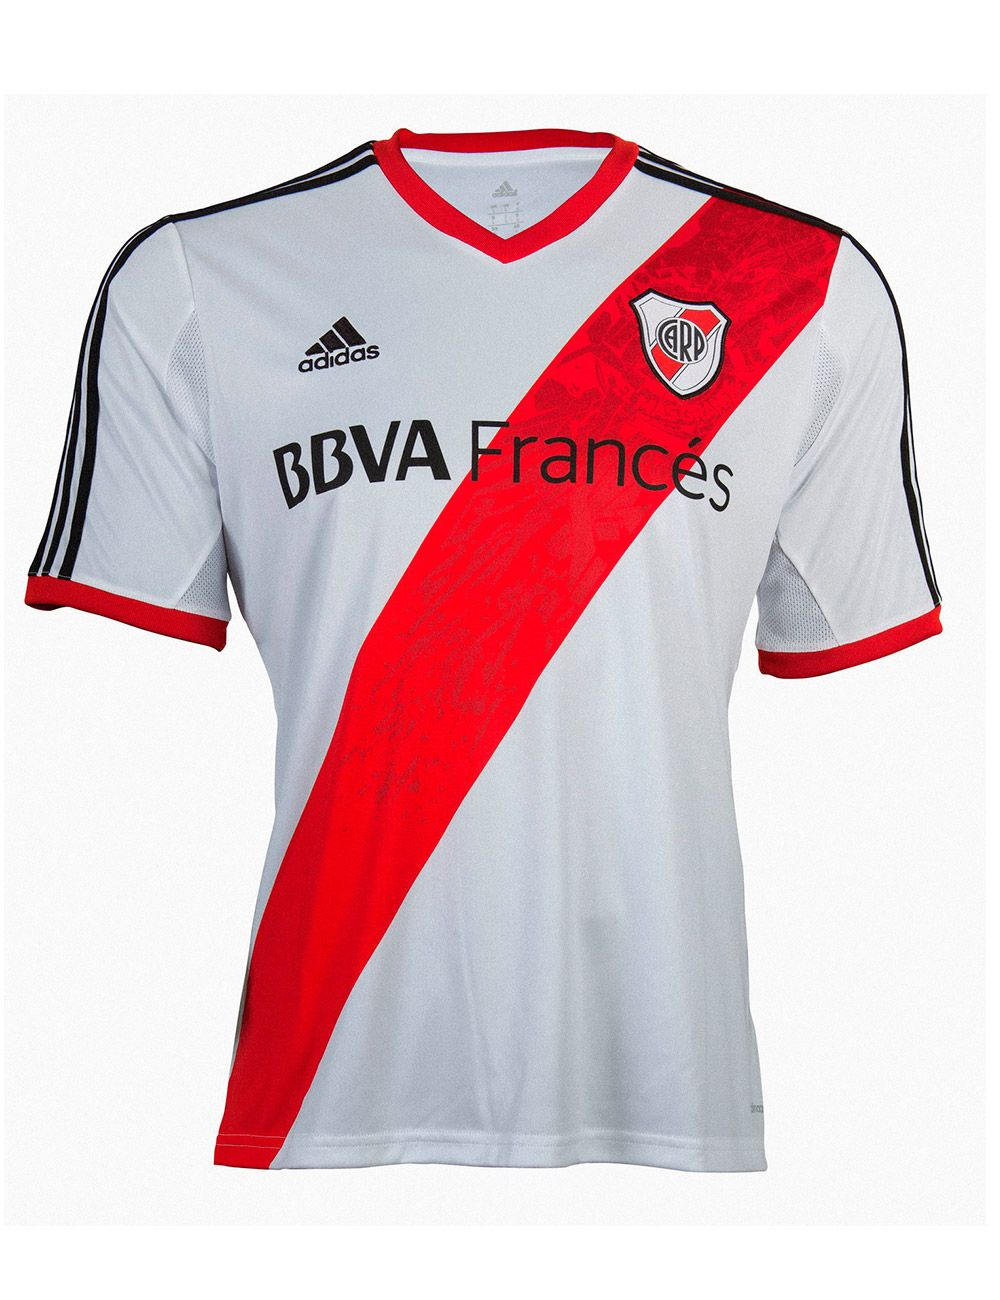 9d9d6157f River Plate - Adidas 2013.